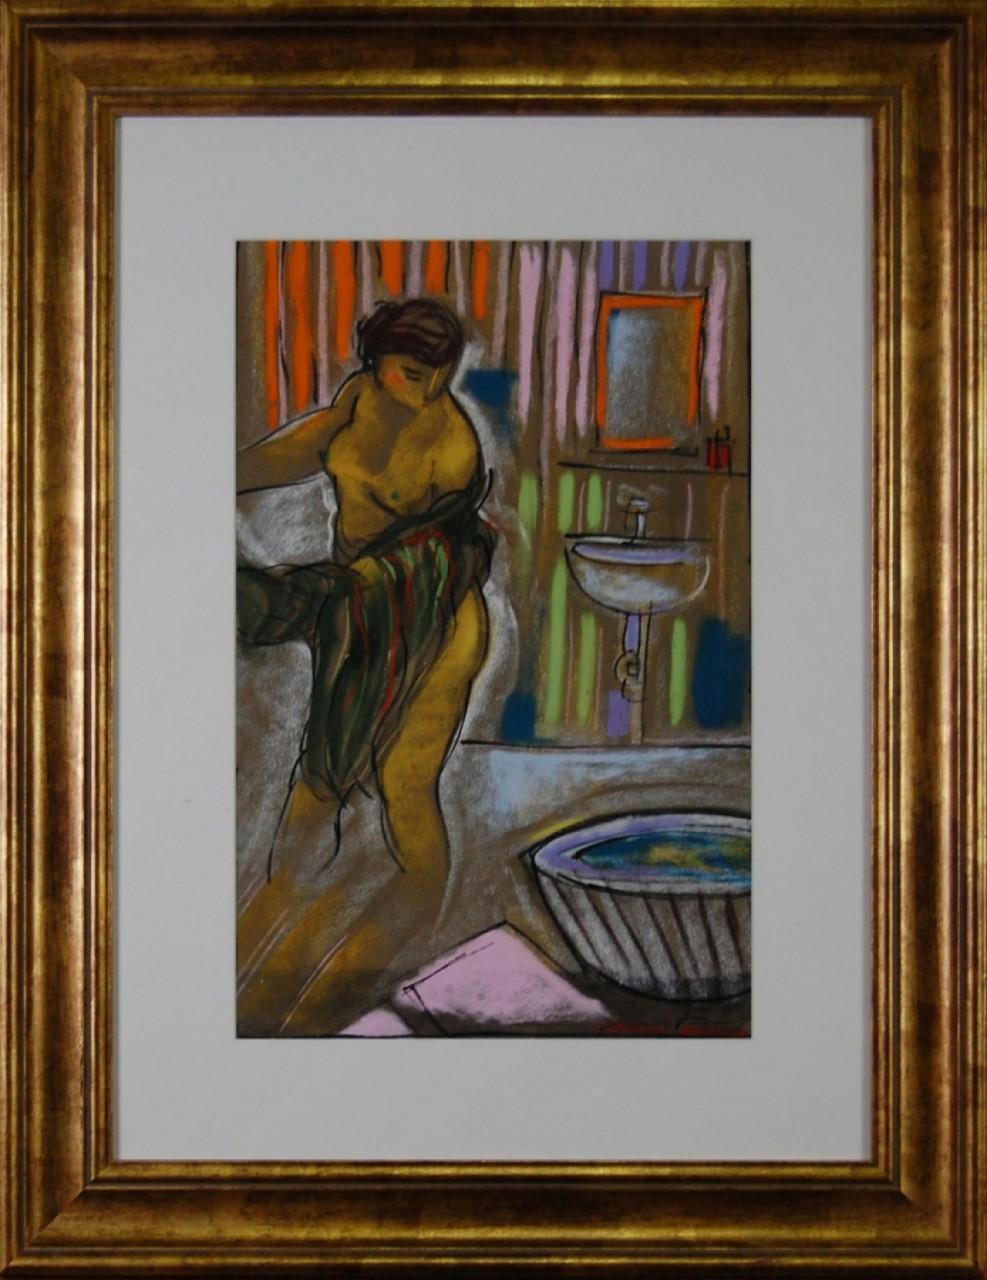 MARTINERY Philippe femme nue faisant sa toilettes